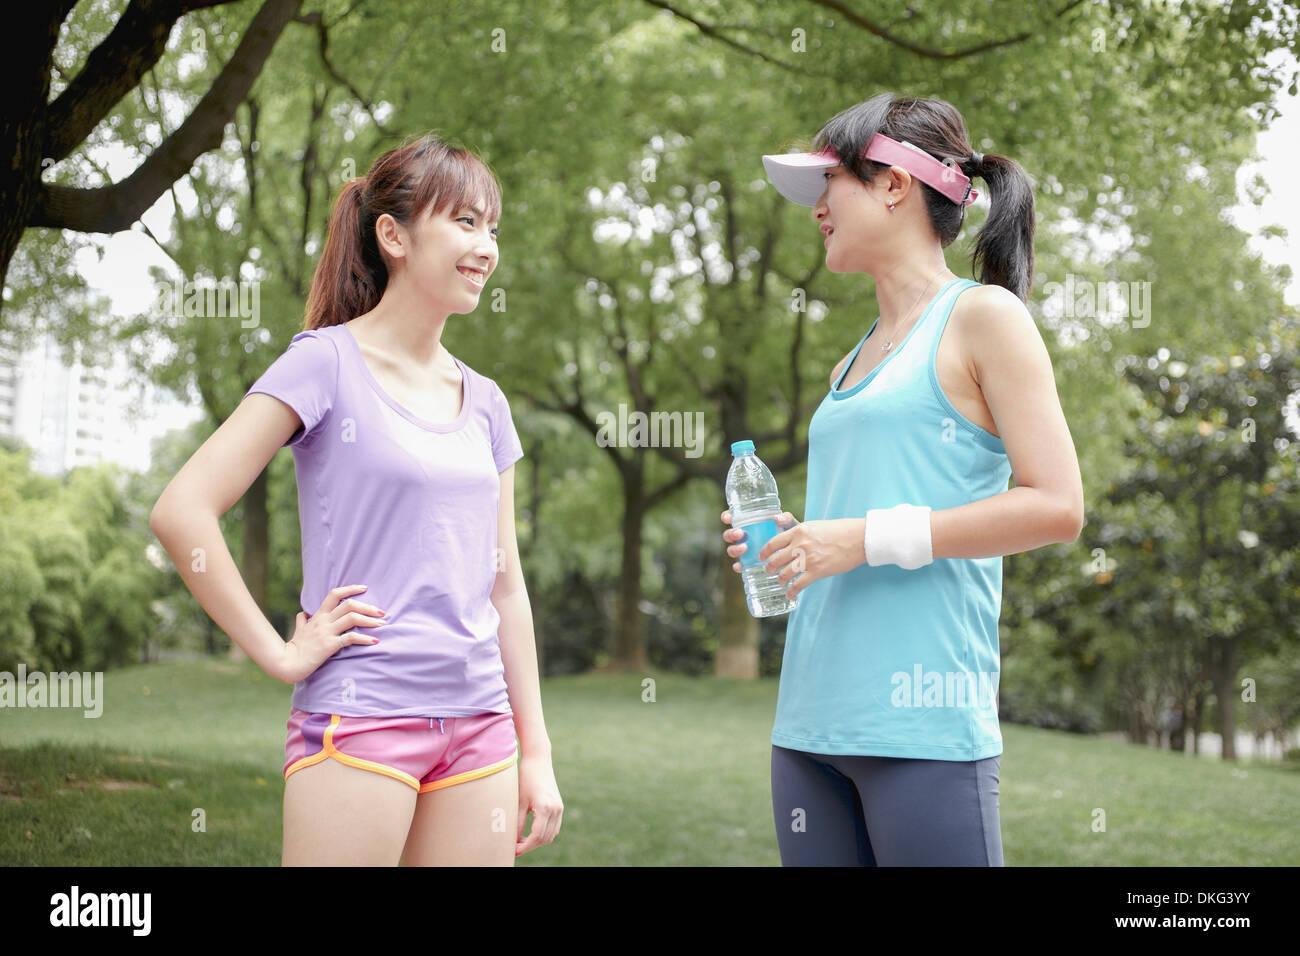 Female joggers taking a break in park - Stock Image